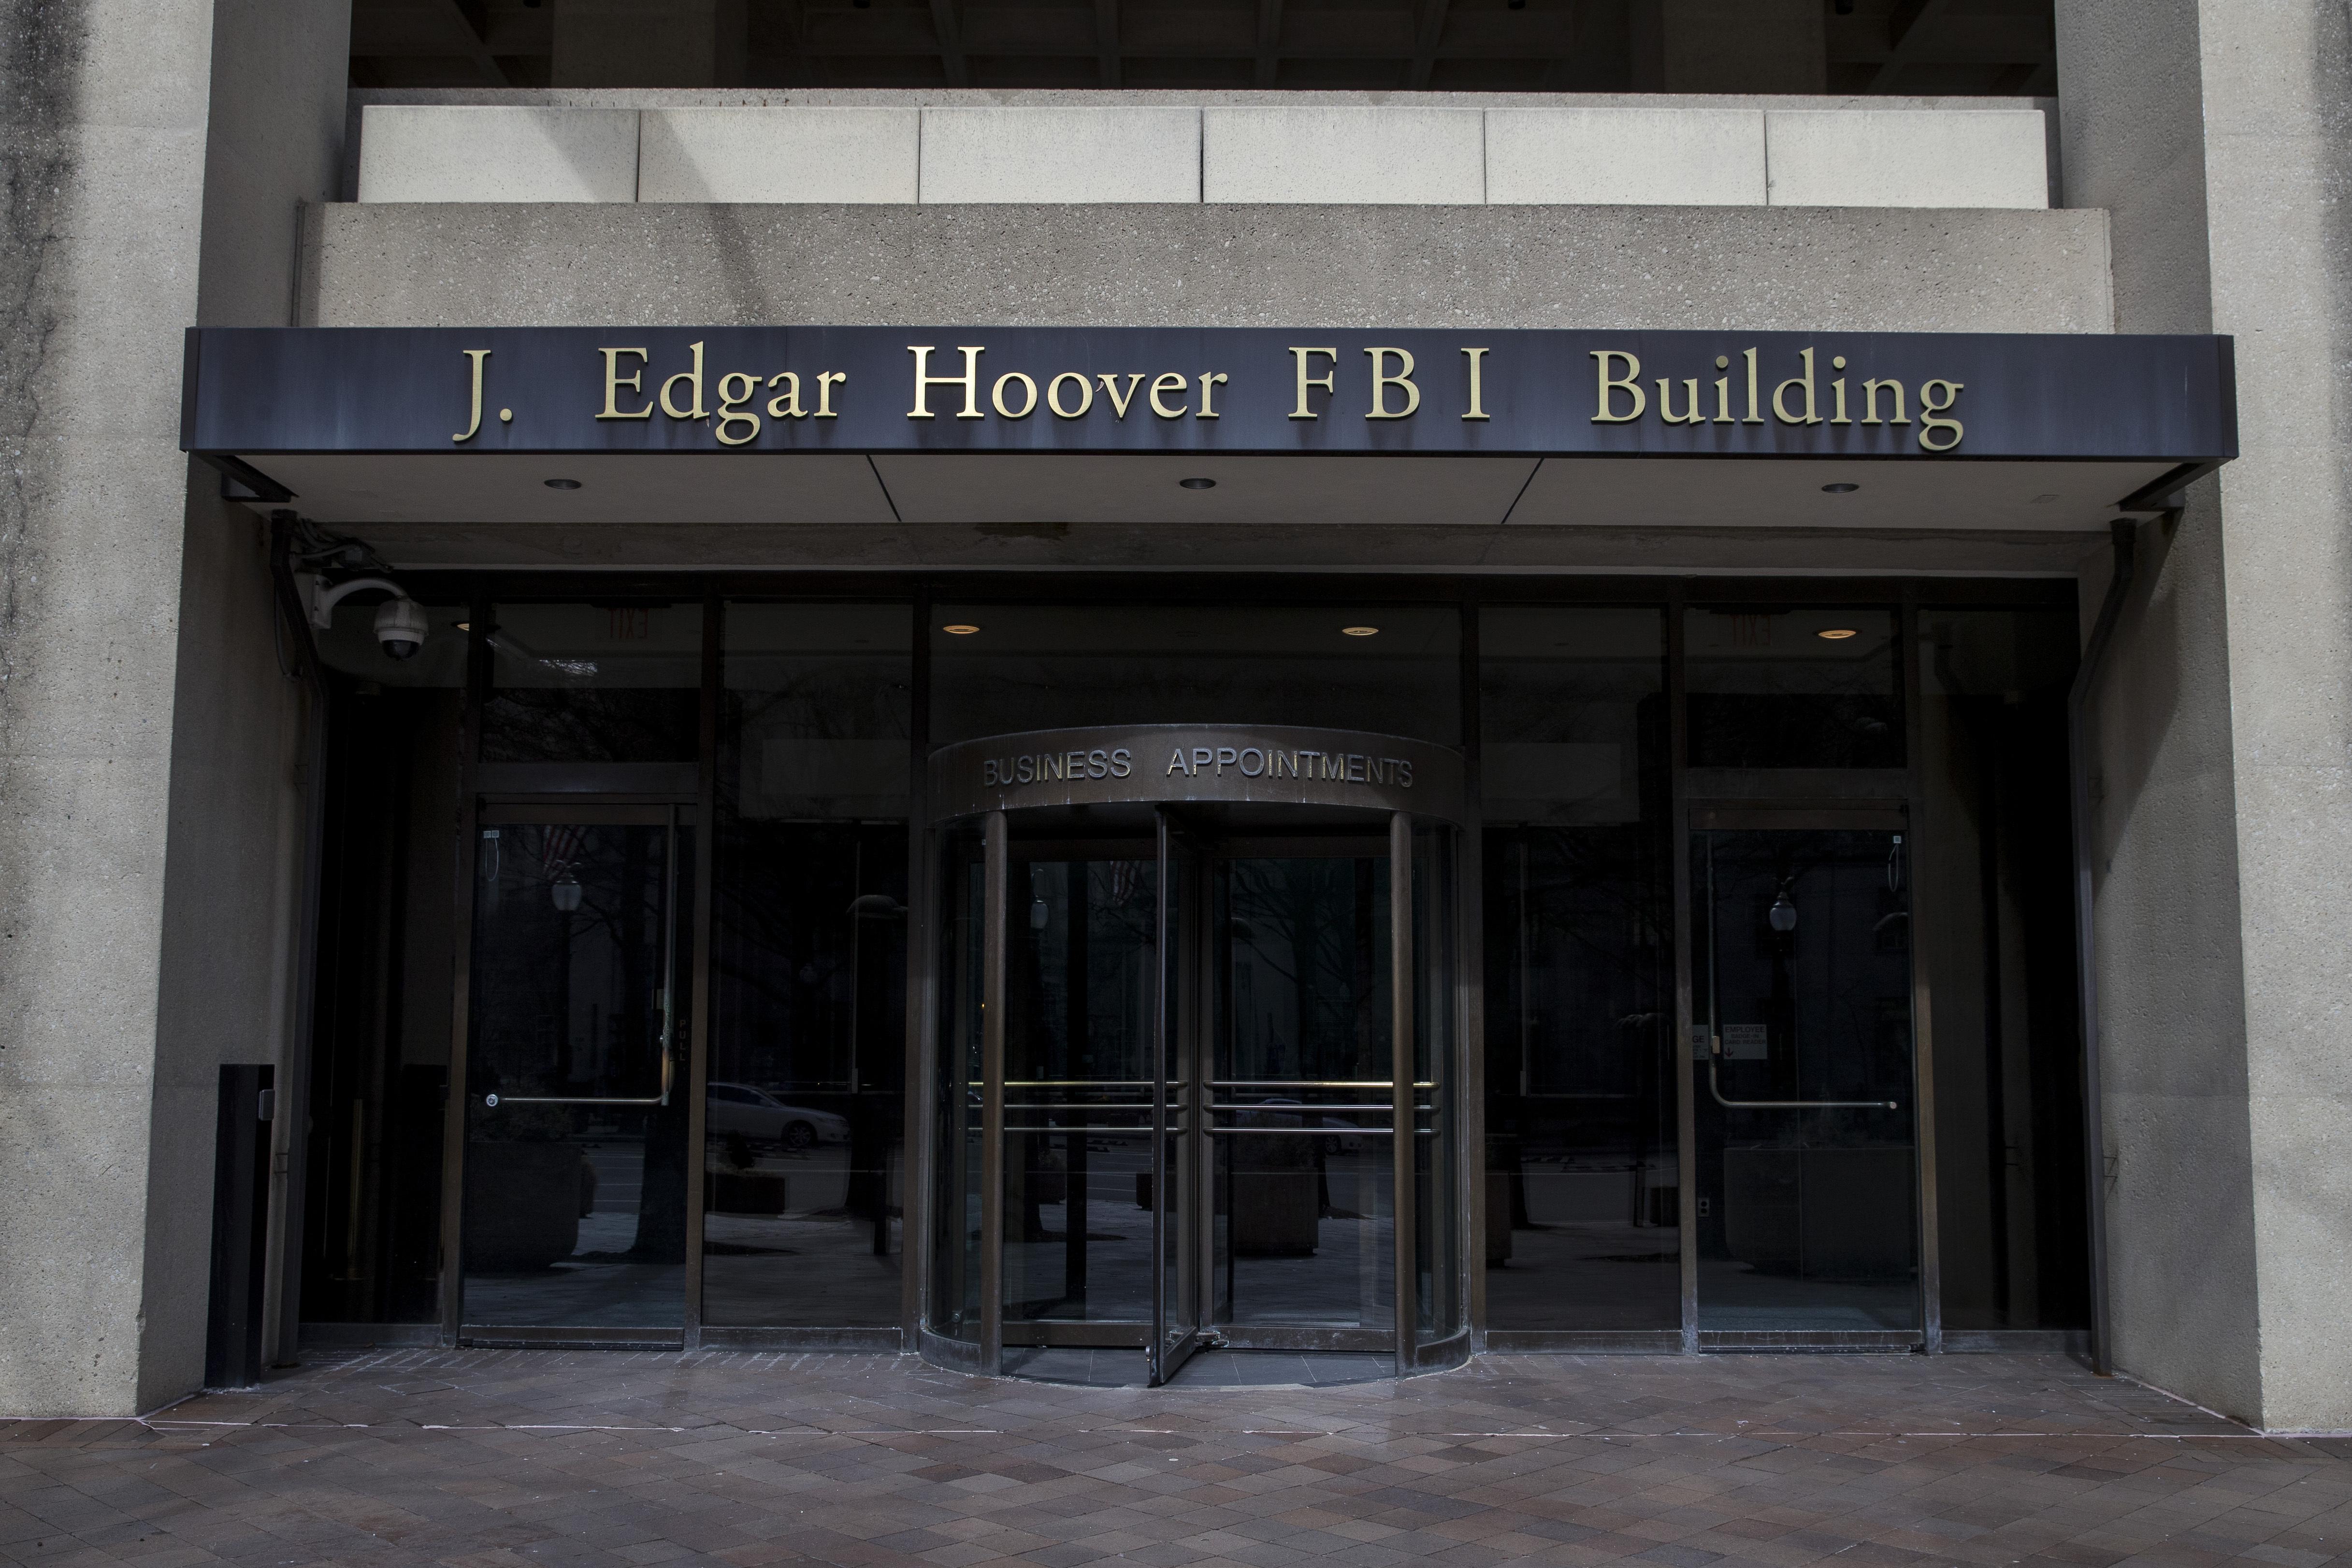 Outrage over David Kris muddies battle over secret FISA court